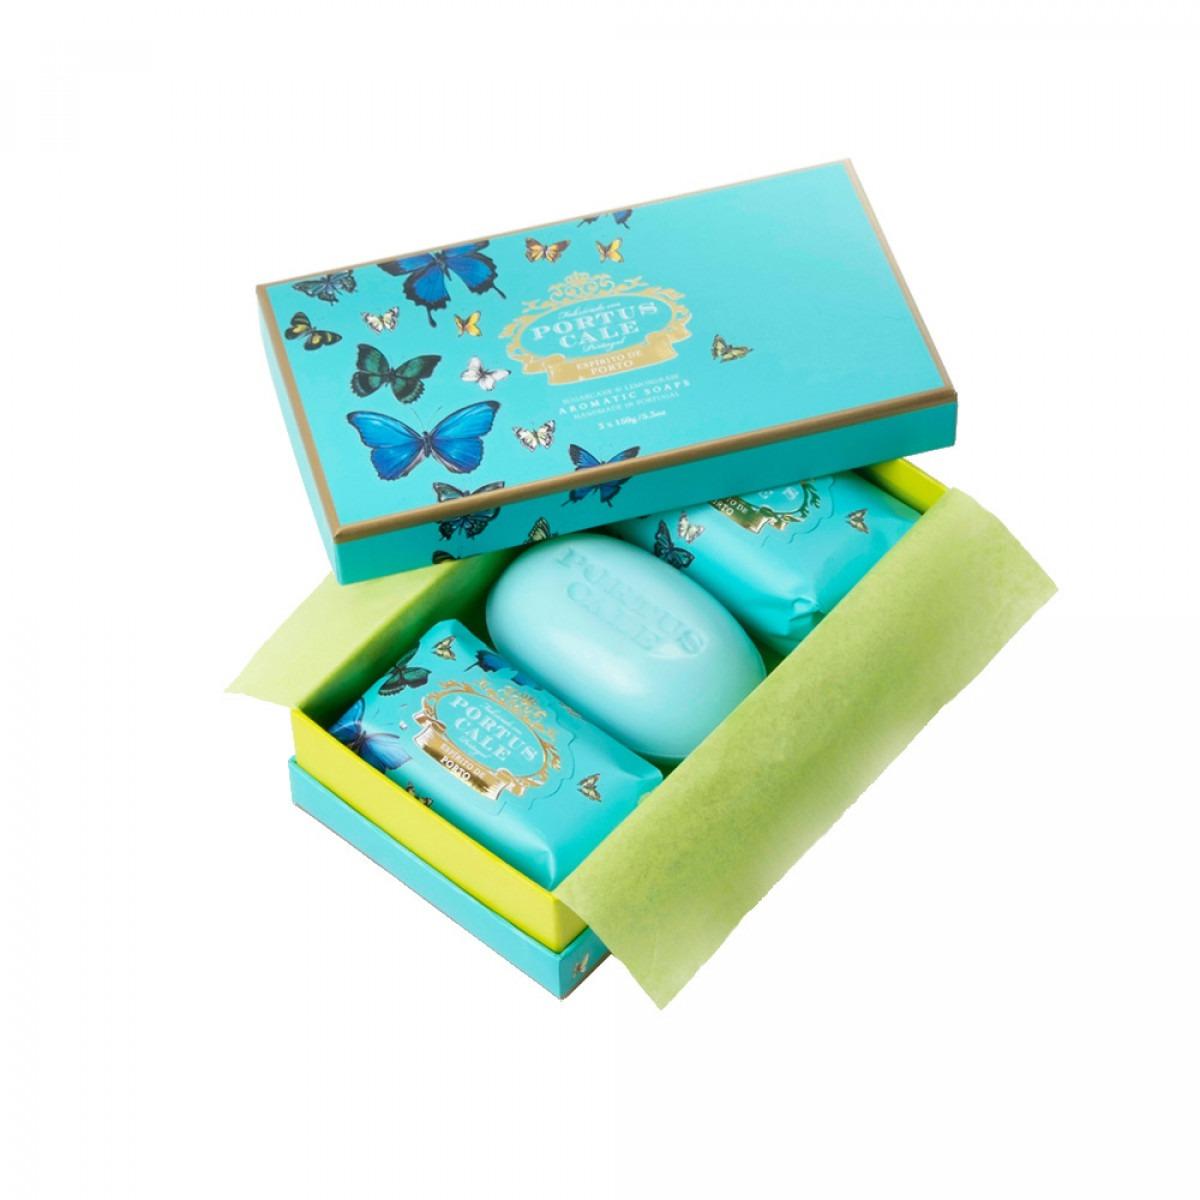 Portus Cale Box Soaps 3 x 150g